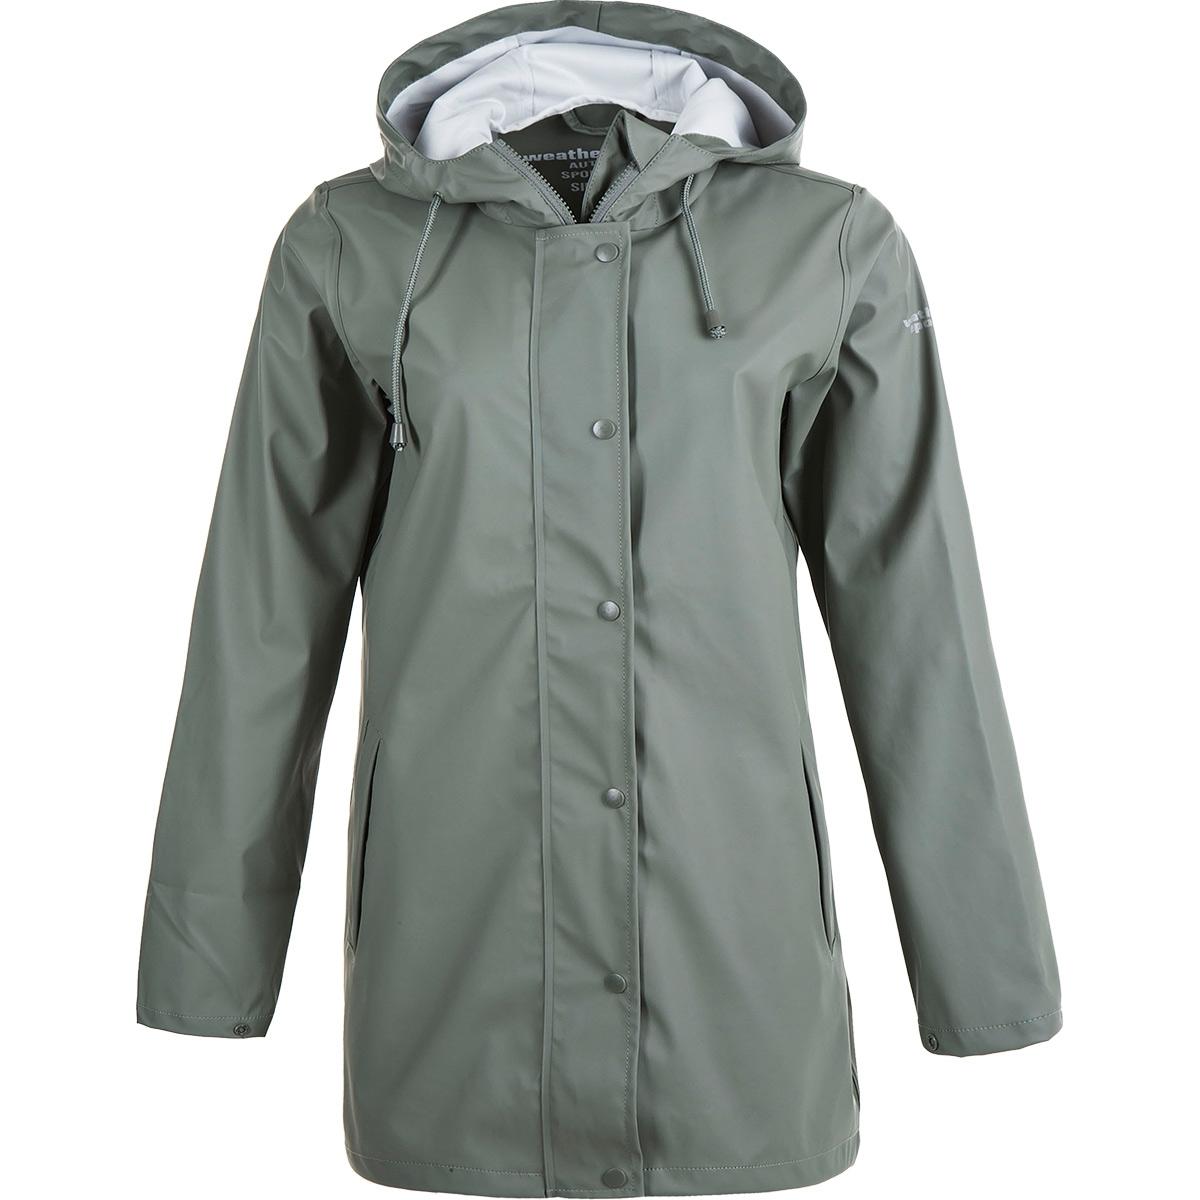 Bilde av Petra W Rain jacket 3056 Agave Green